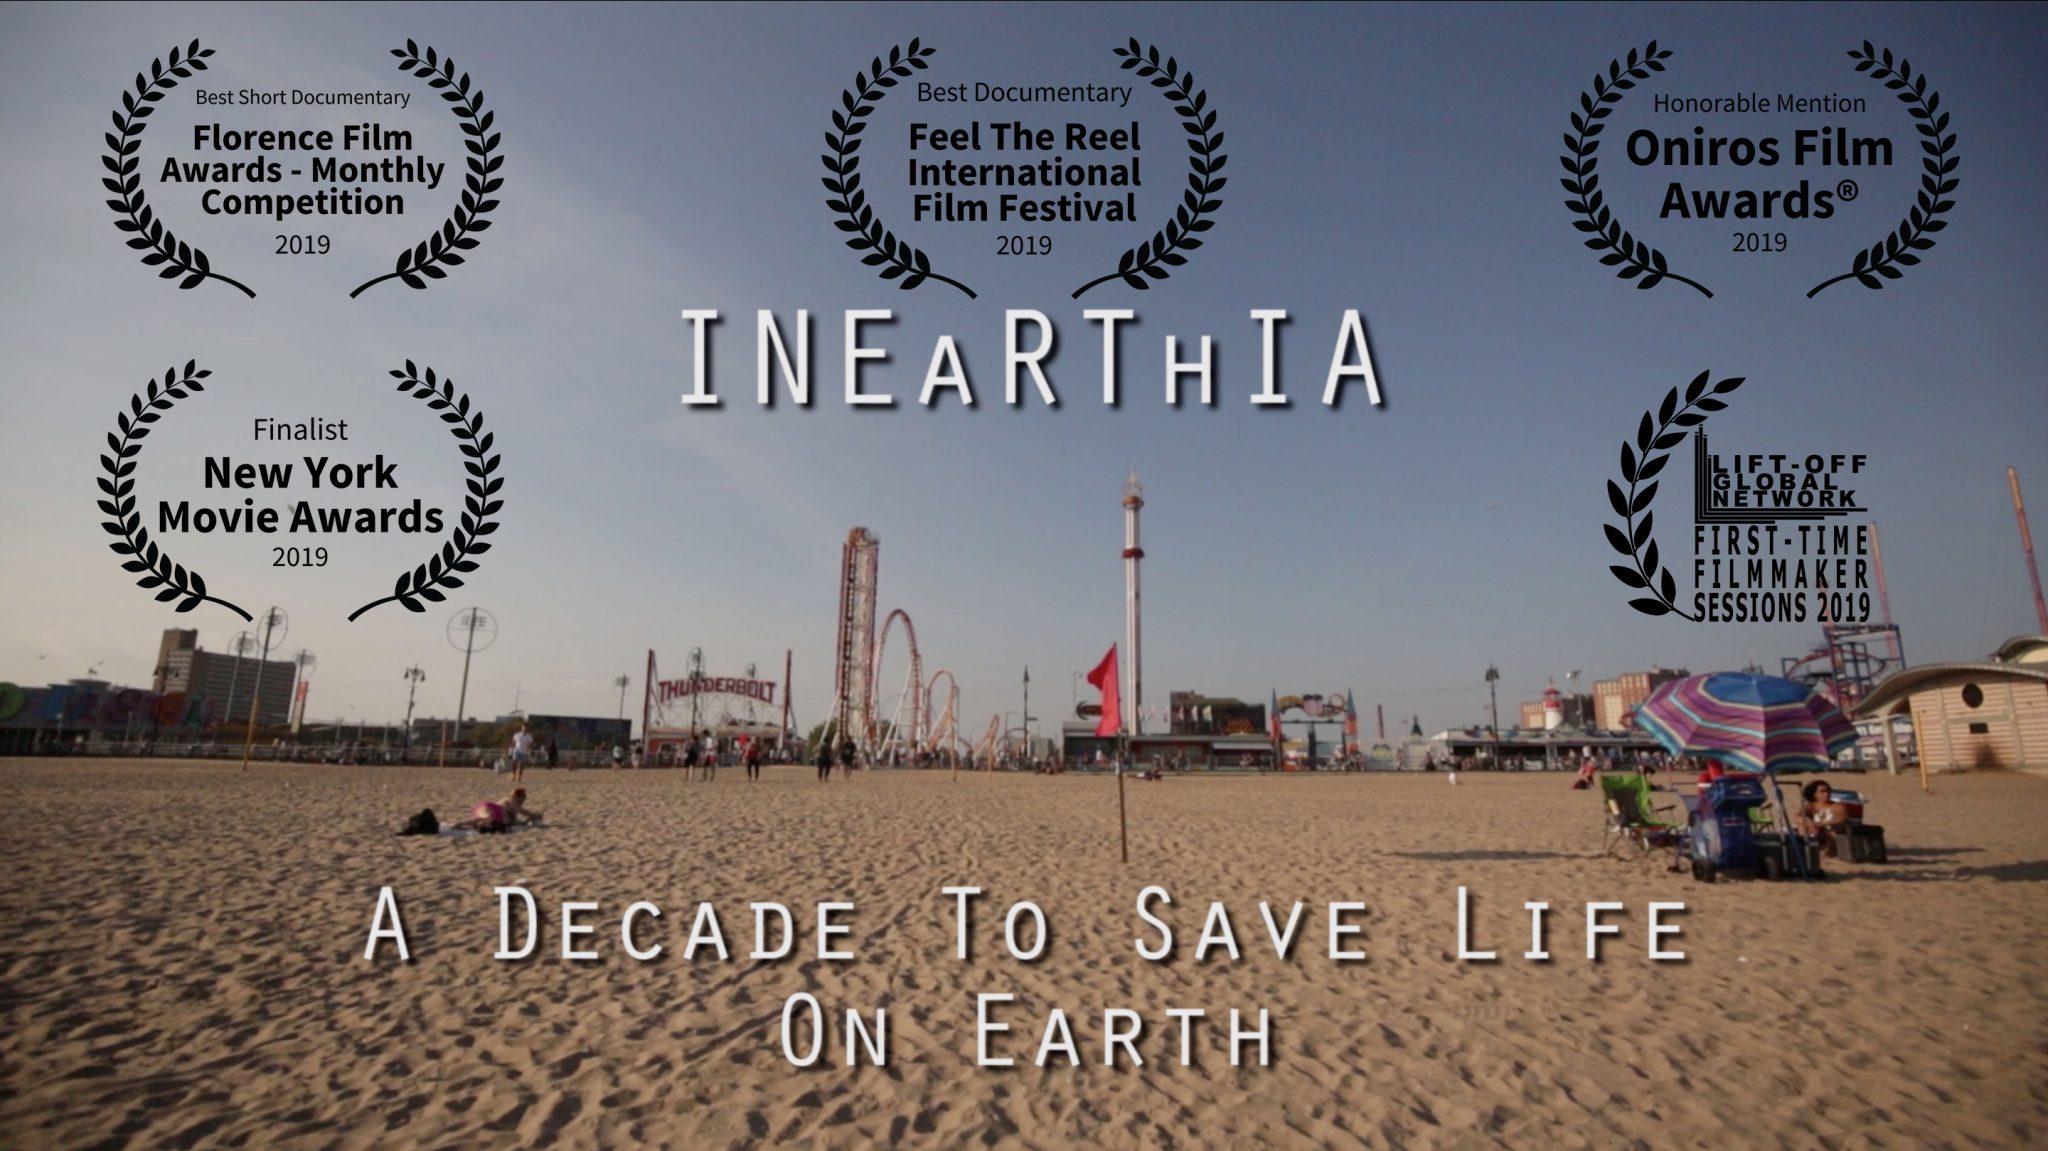 INEARTHIA – A Decade To Save Life On Earth